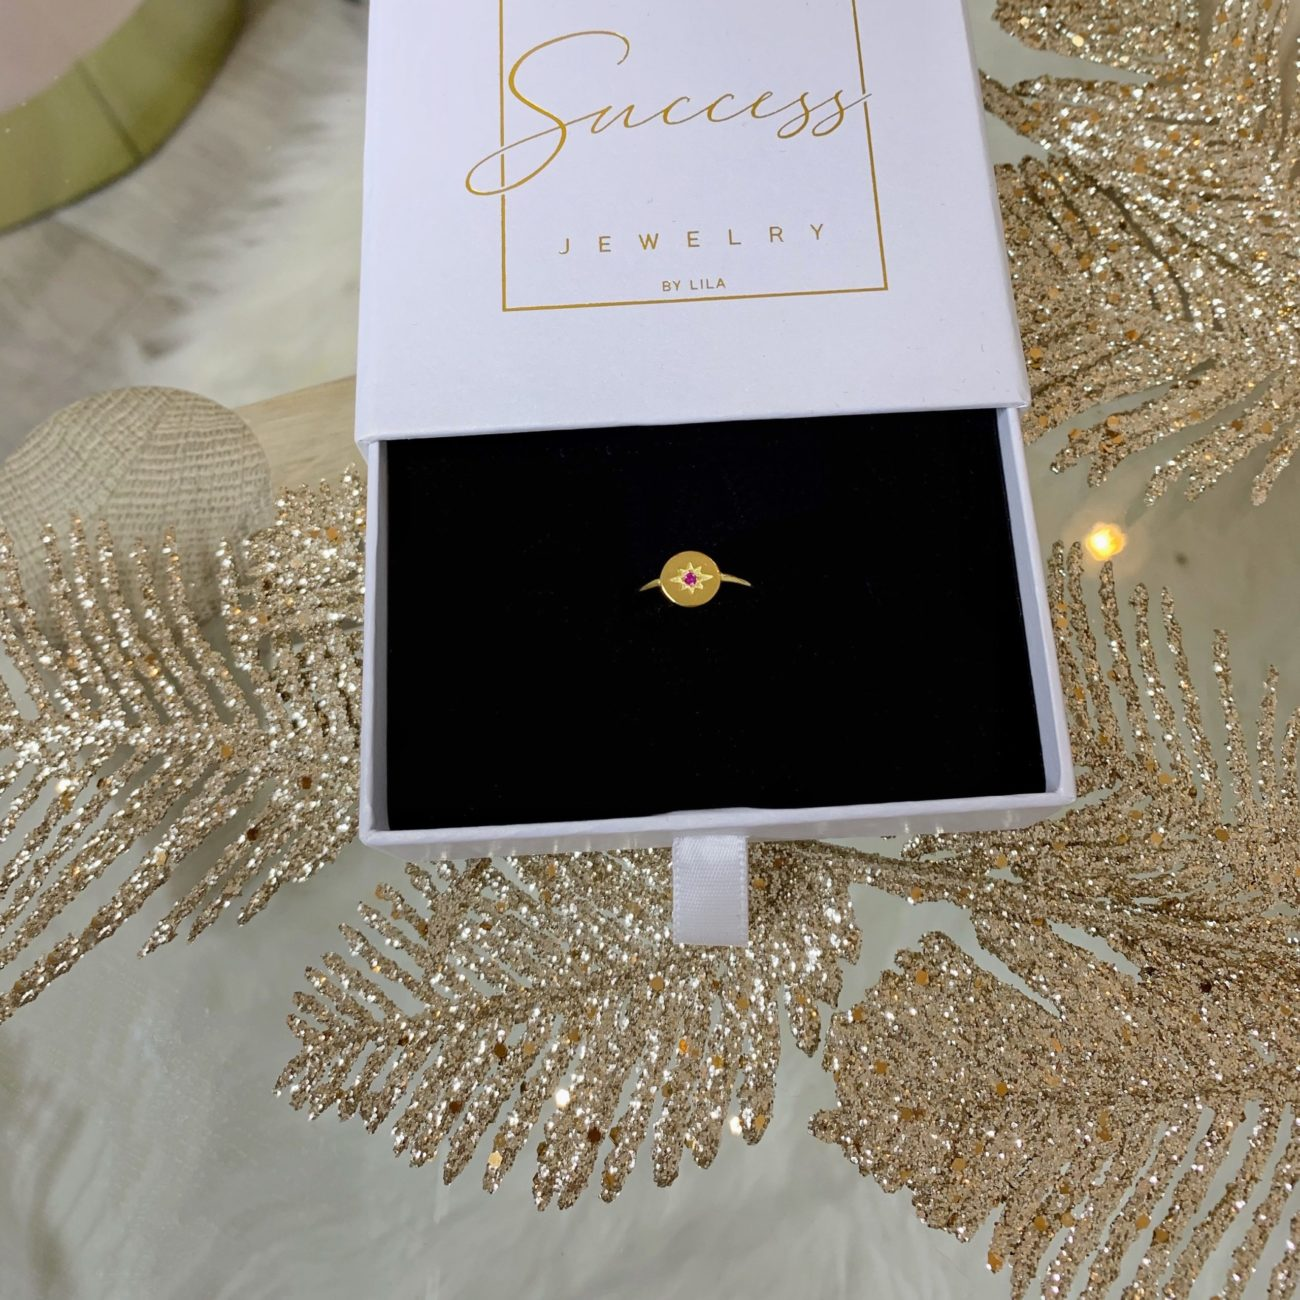 www.successjewelryparis.com